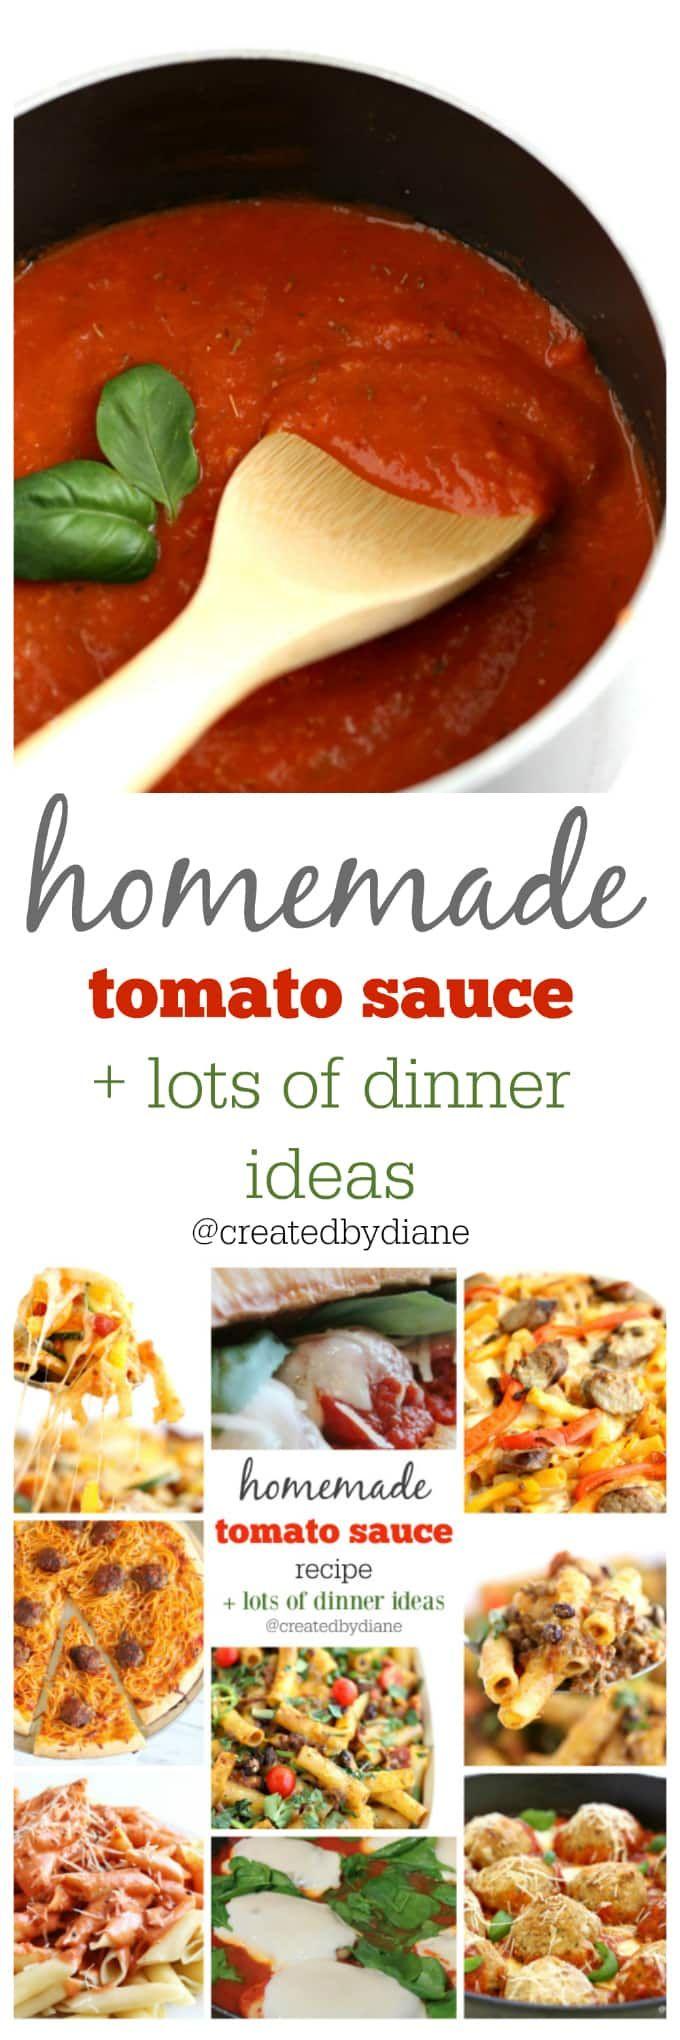 marinara sauce recipe with lots of easy dinner ide…Edit description